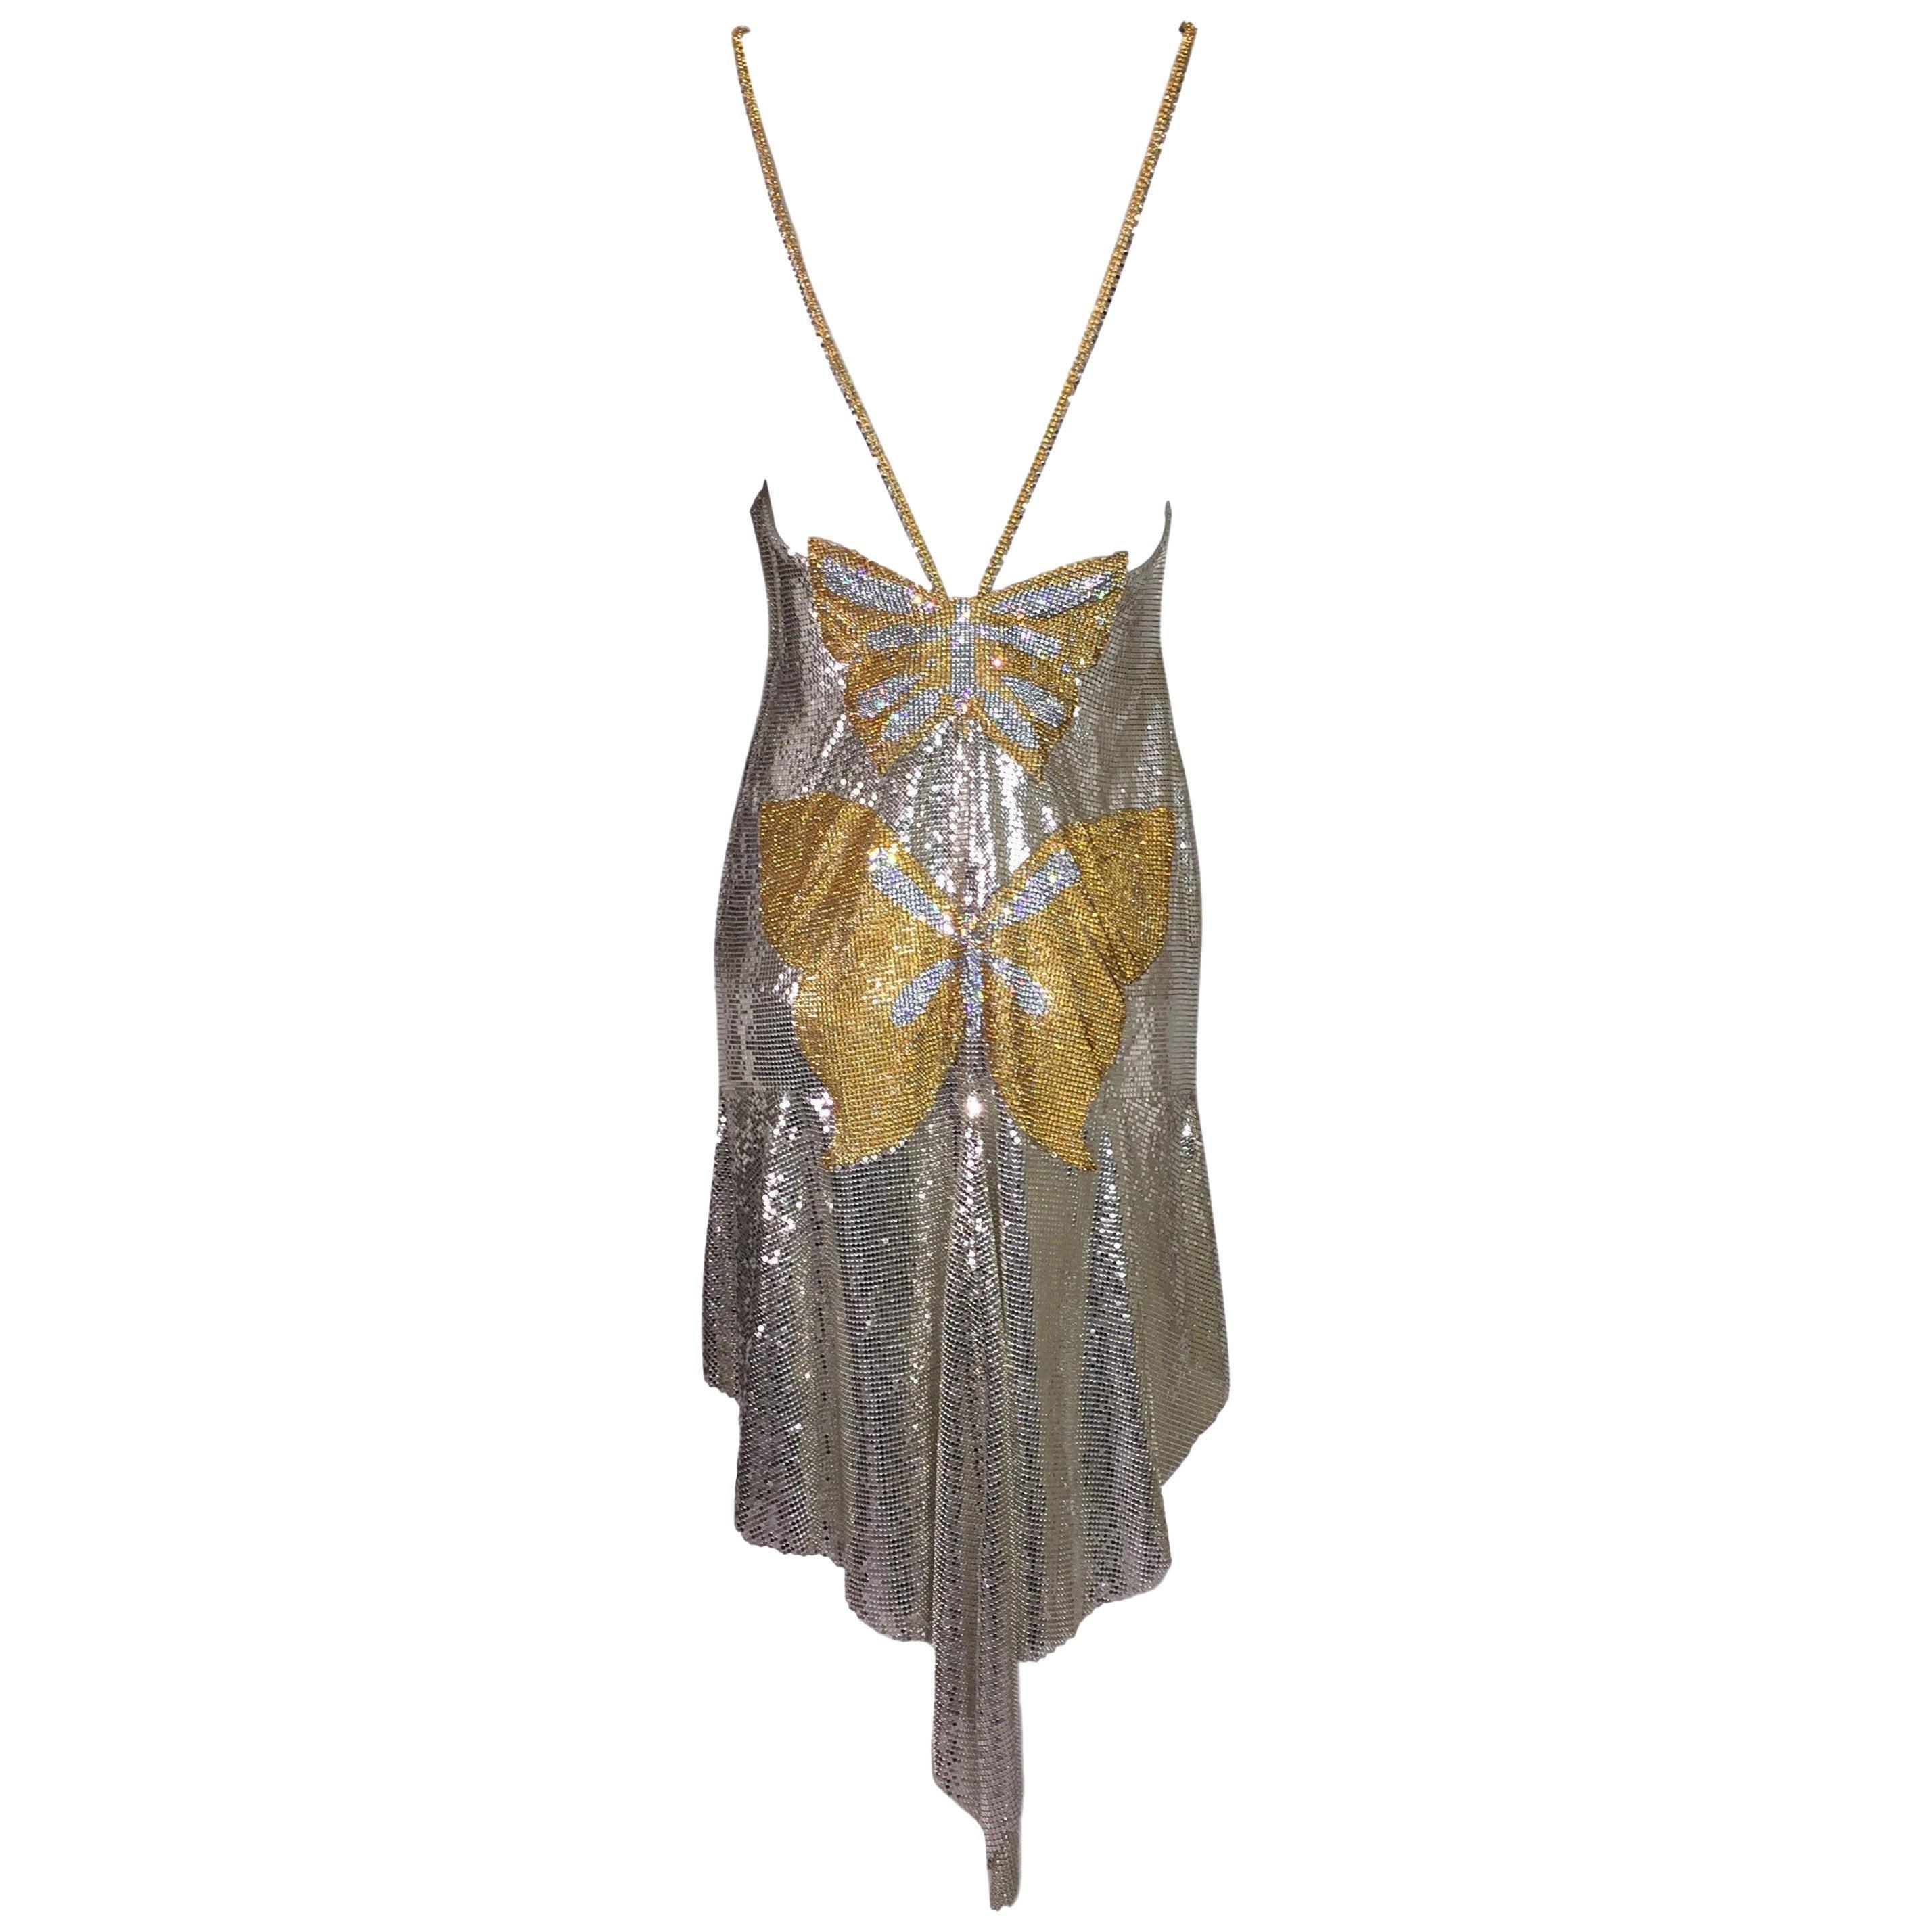 S/S 1999 Atelier Versace Runway Kate Moss Runway Butterfly Metal Chainmail Dress